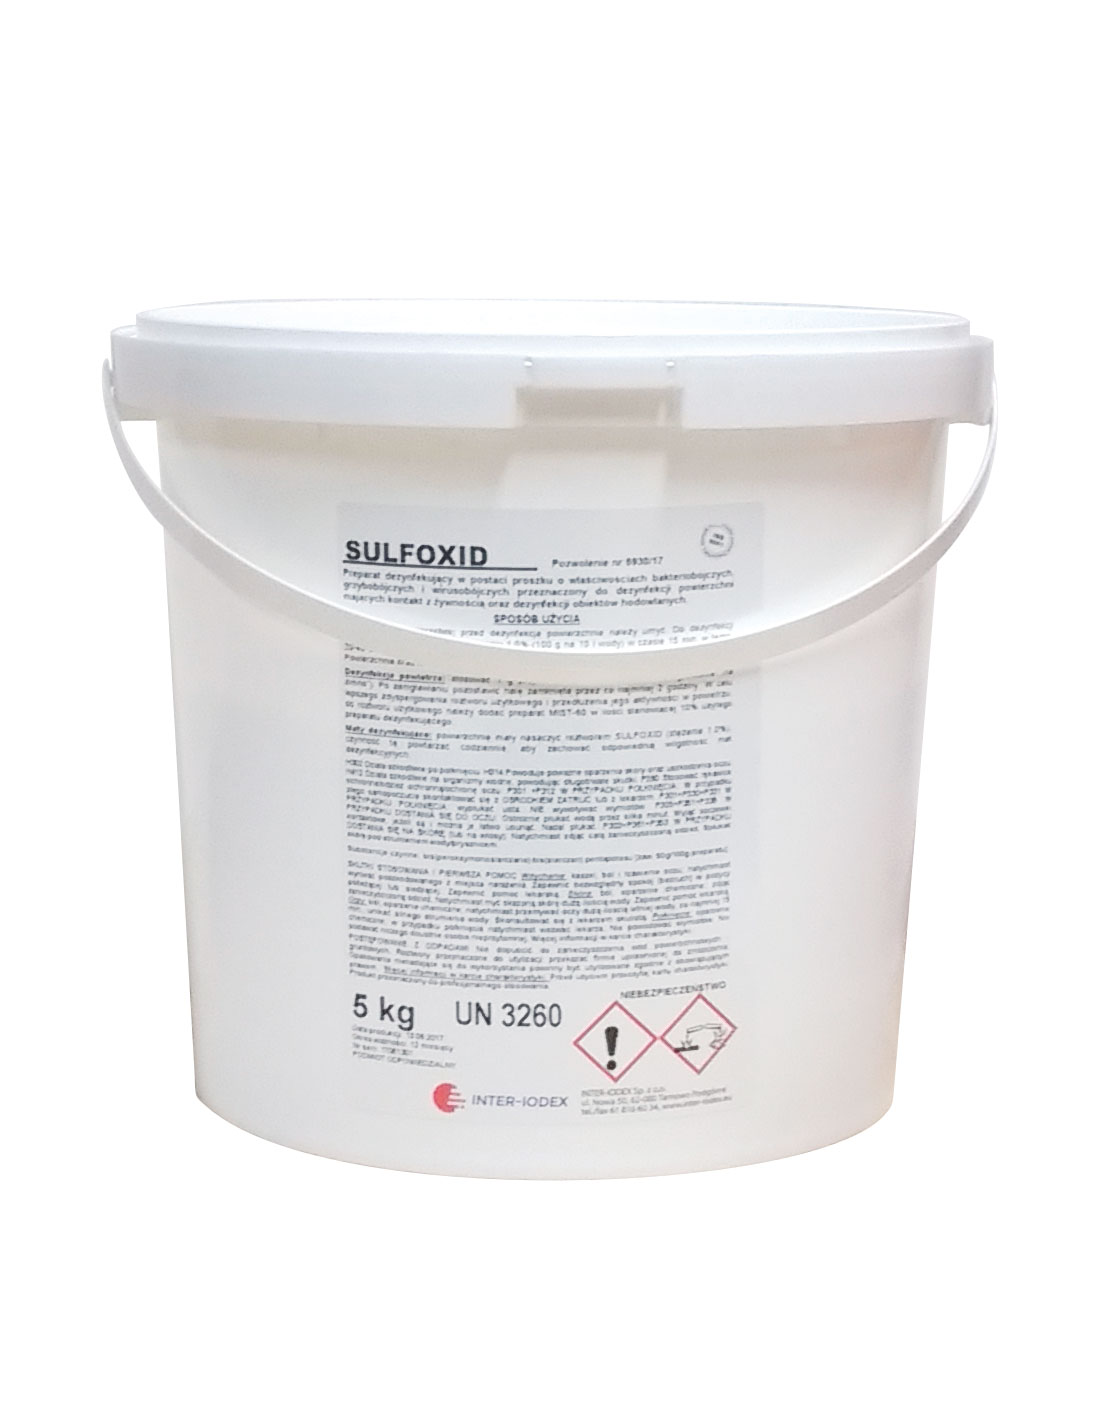 SULFOXID 5 KG